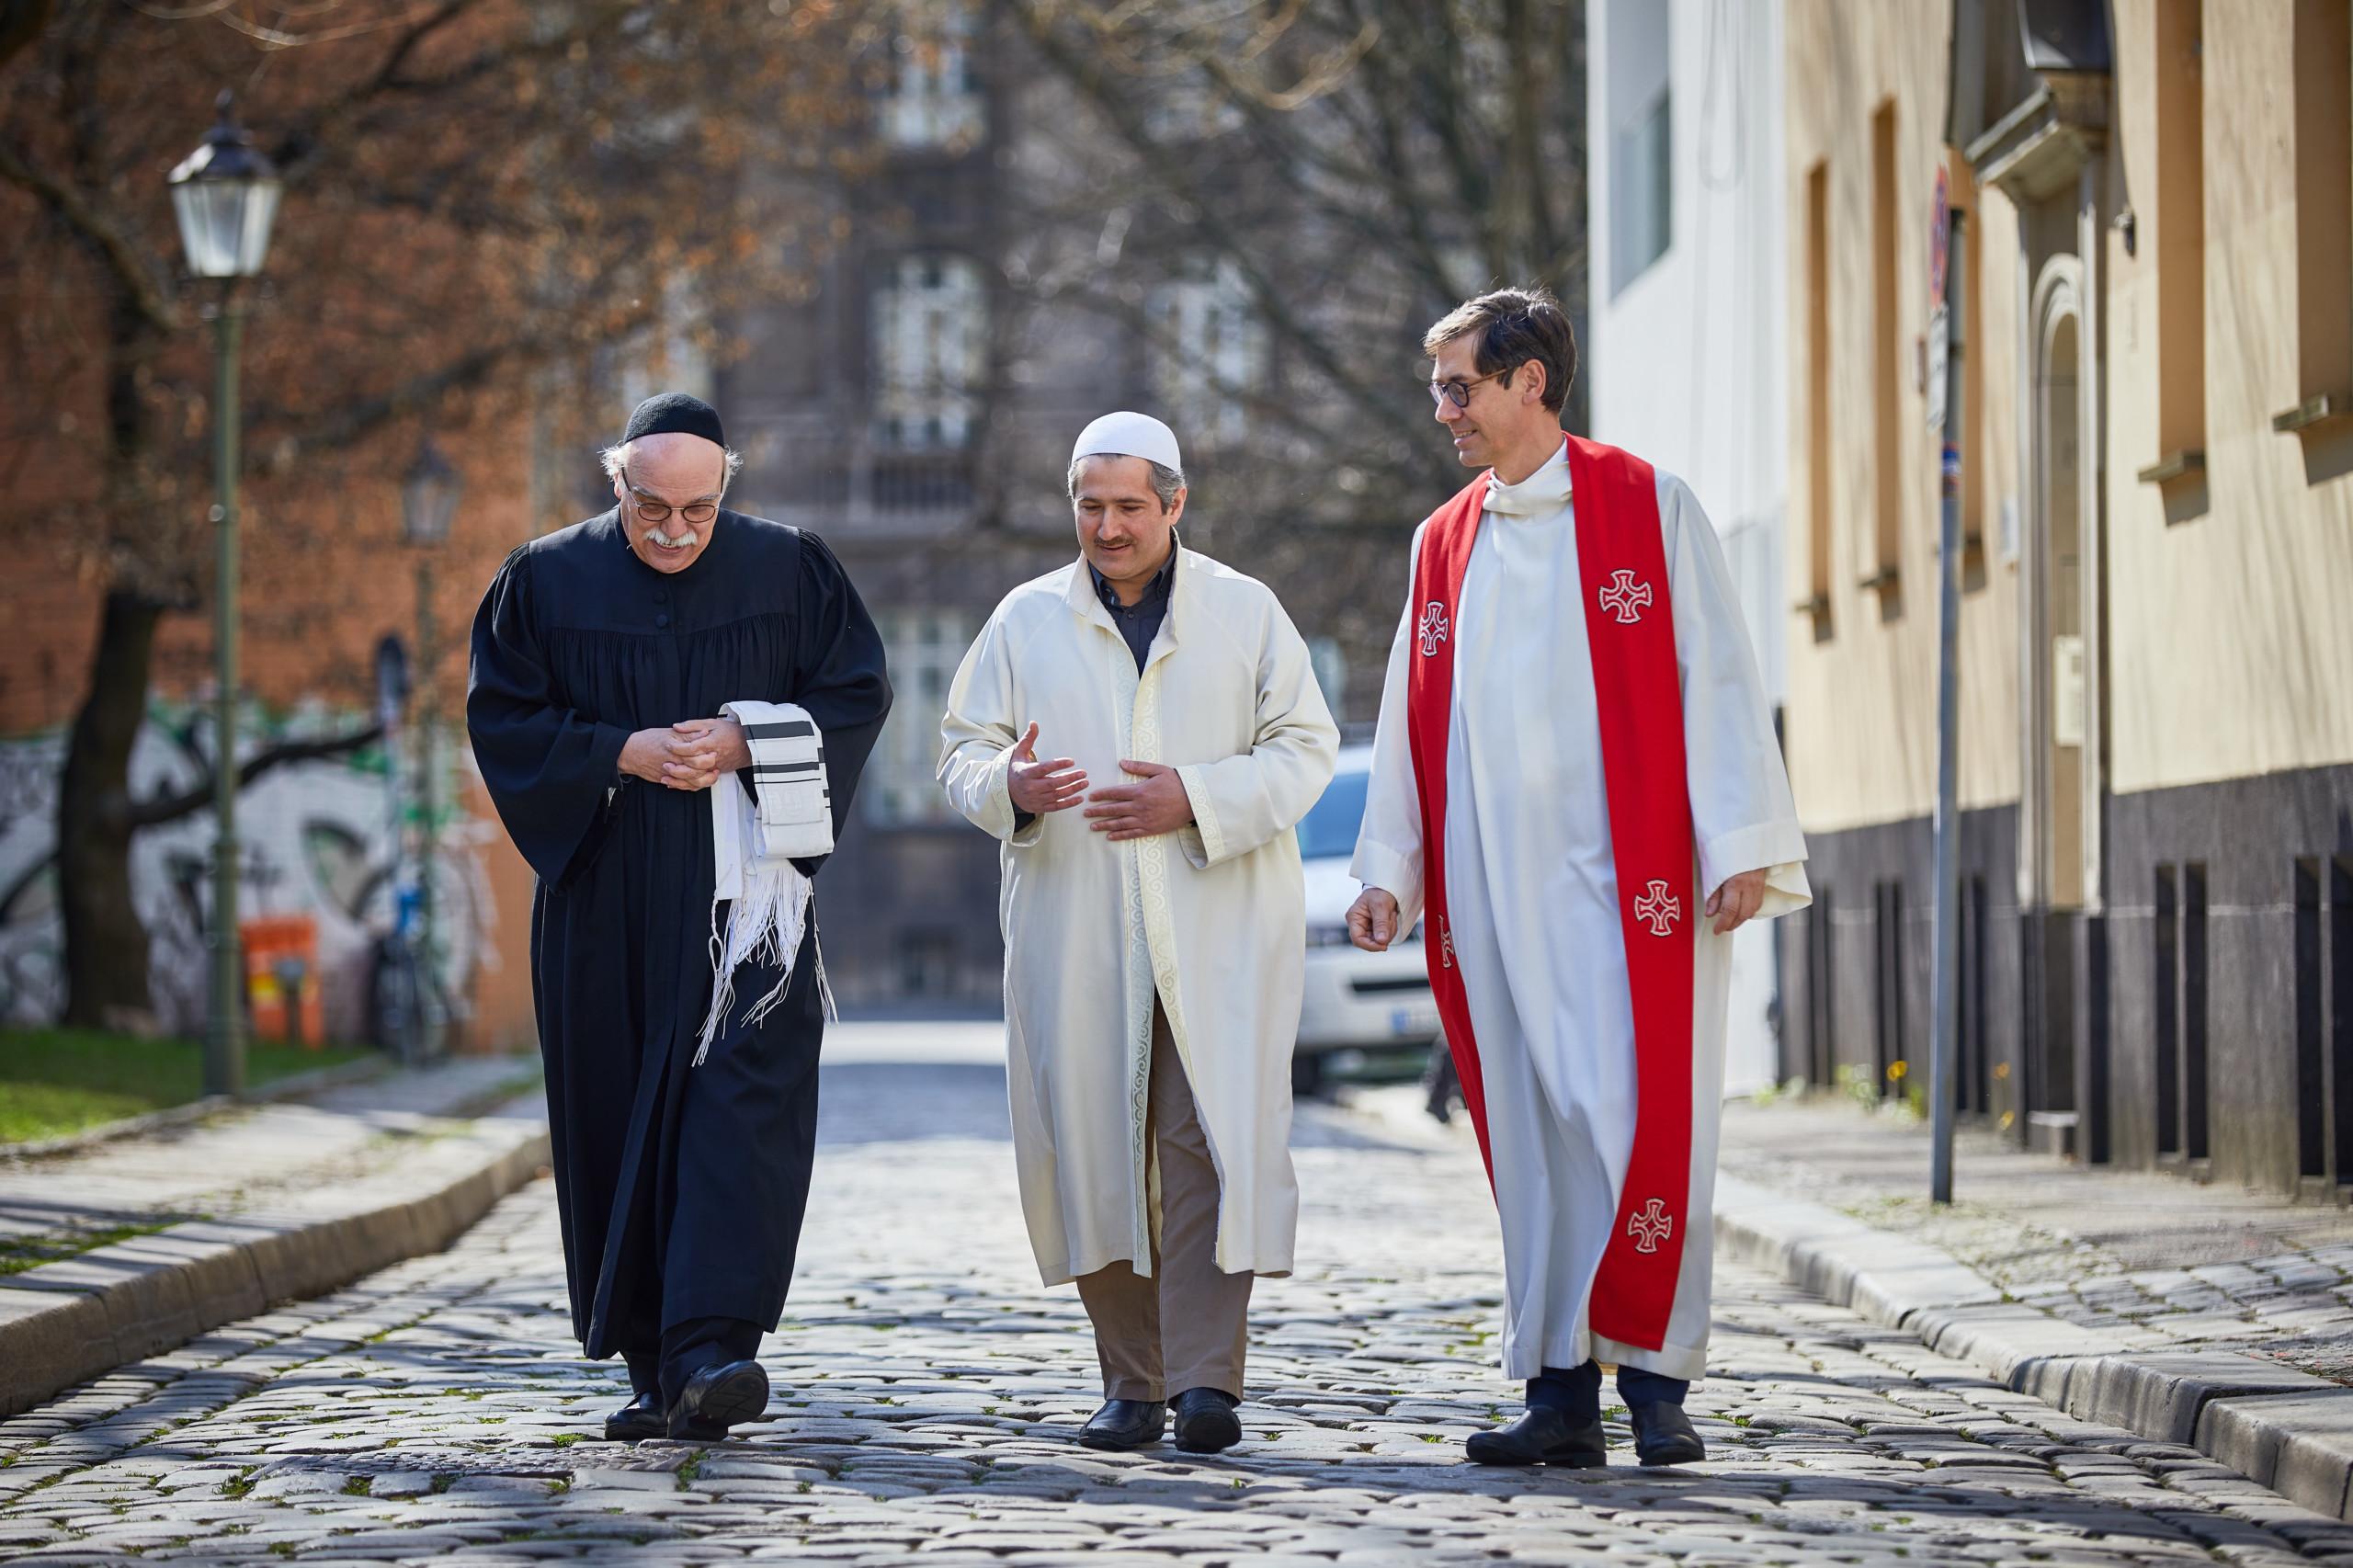 Große Hoffnung in schweren Zeiten: Das House of One versenkt den Grundstein